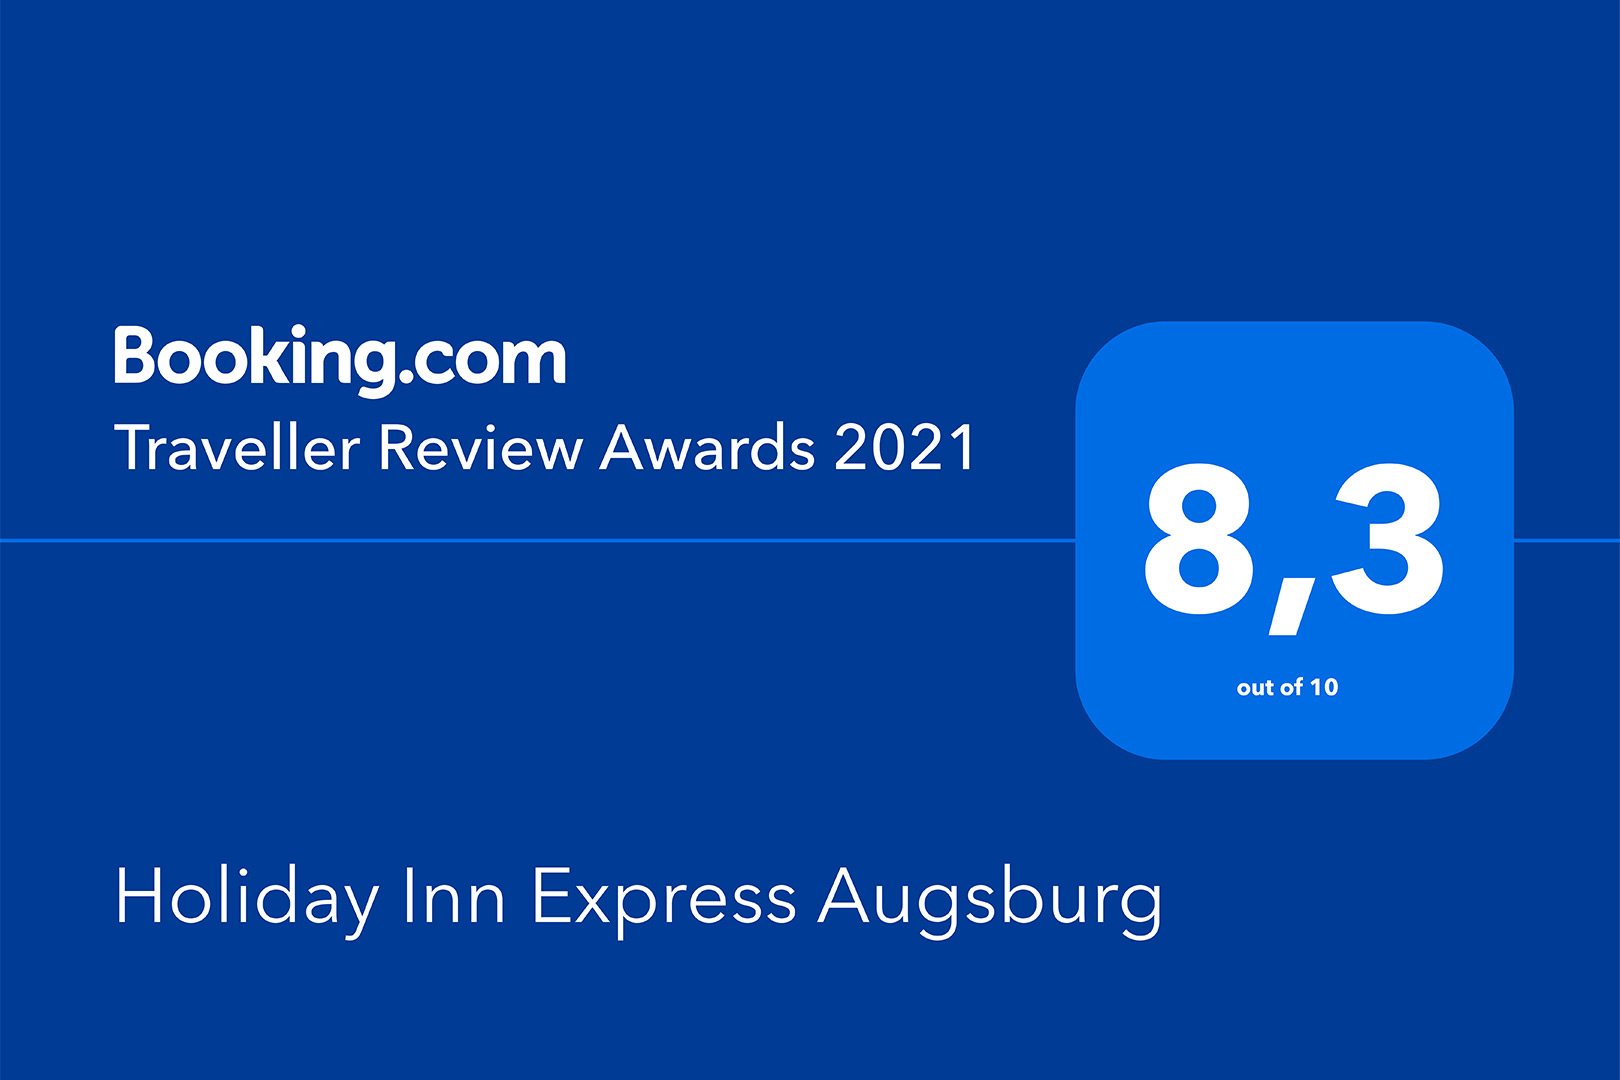 Holiday Inn Express Augsburg - Traveller Review Award 2021